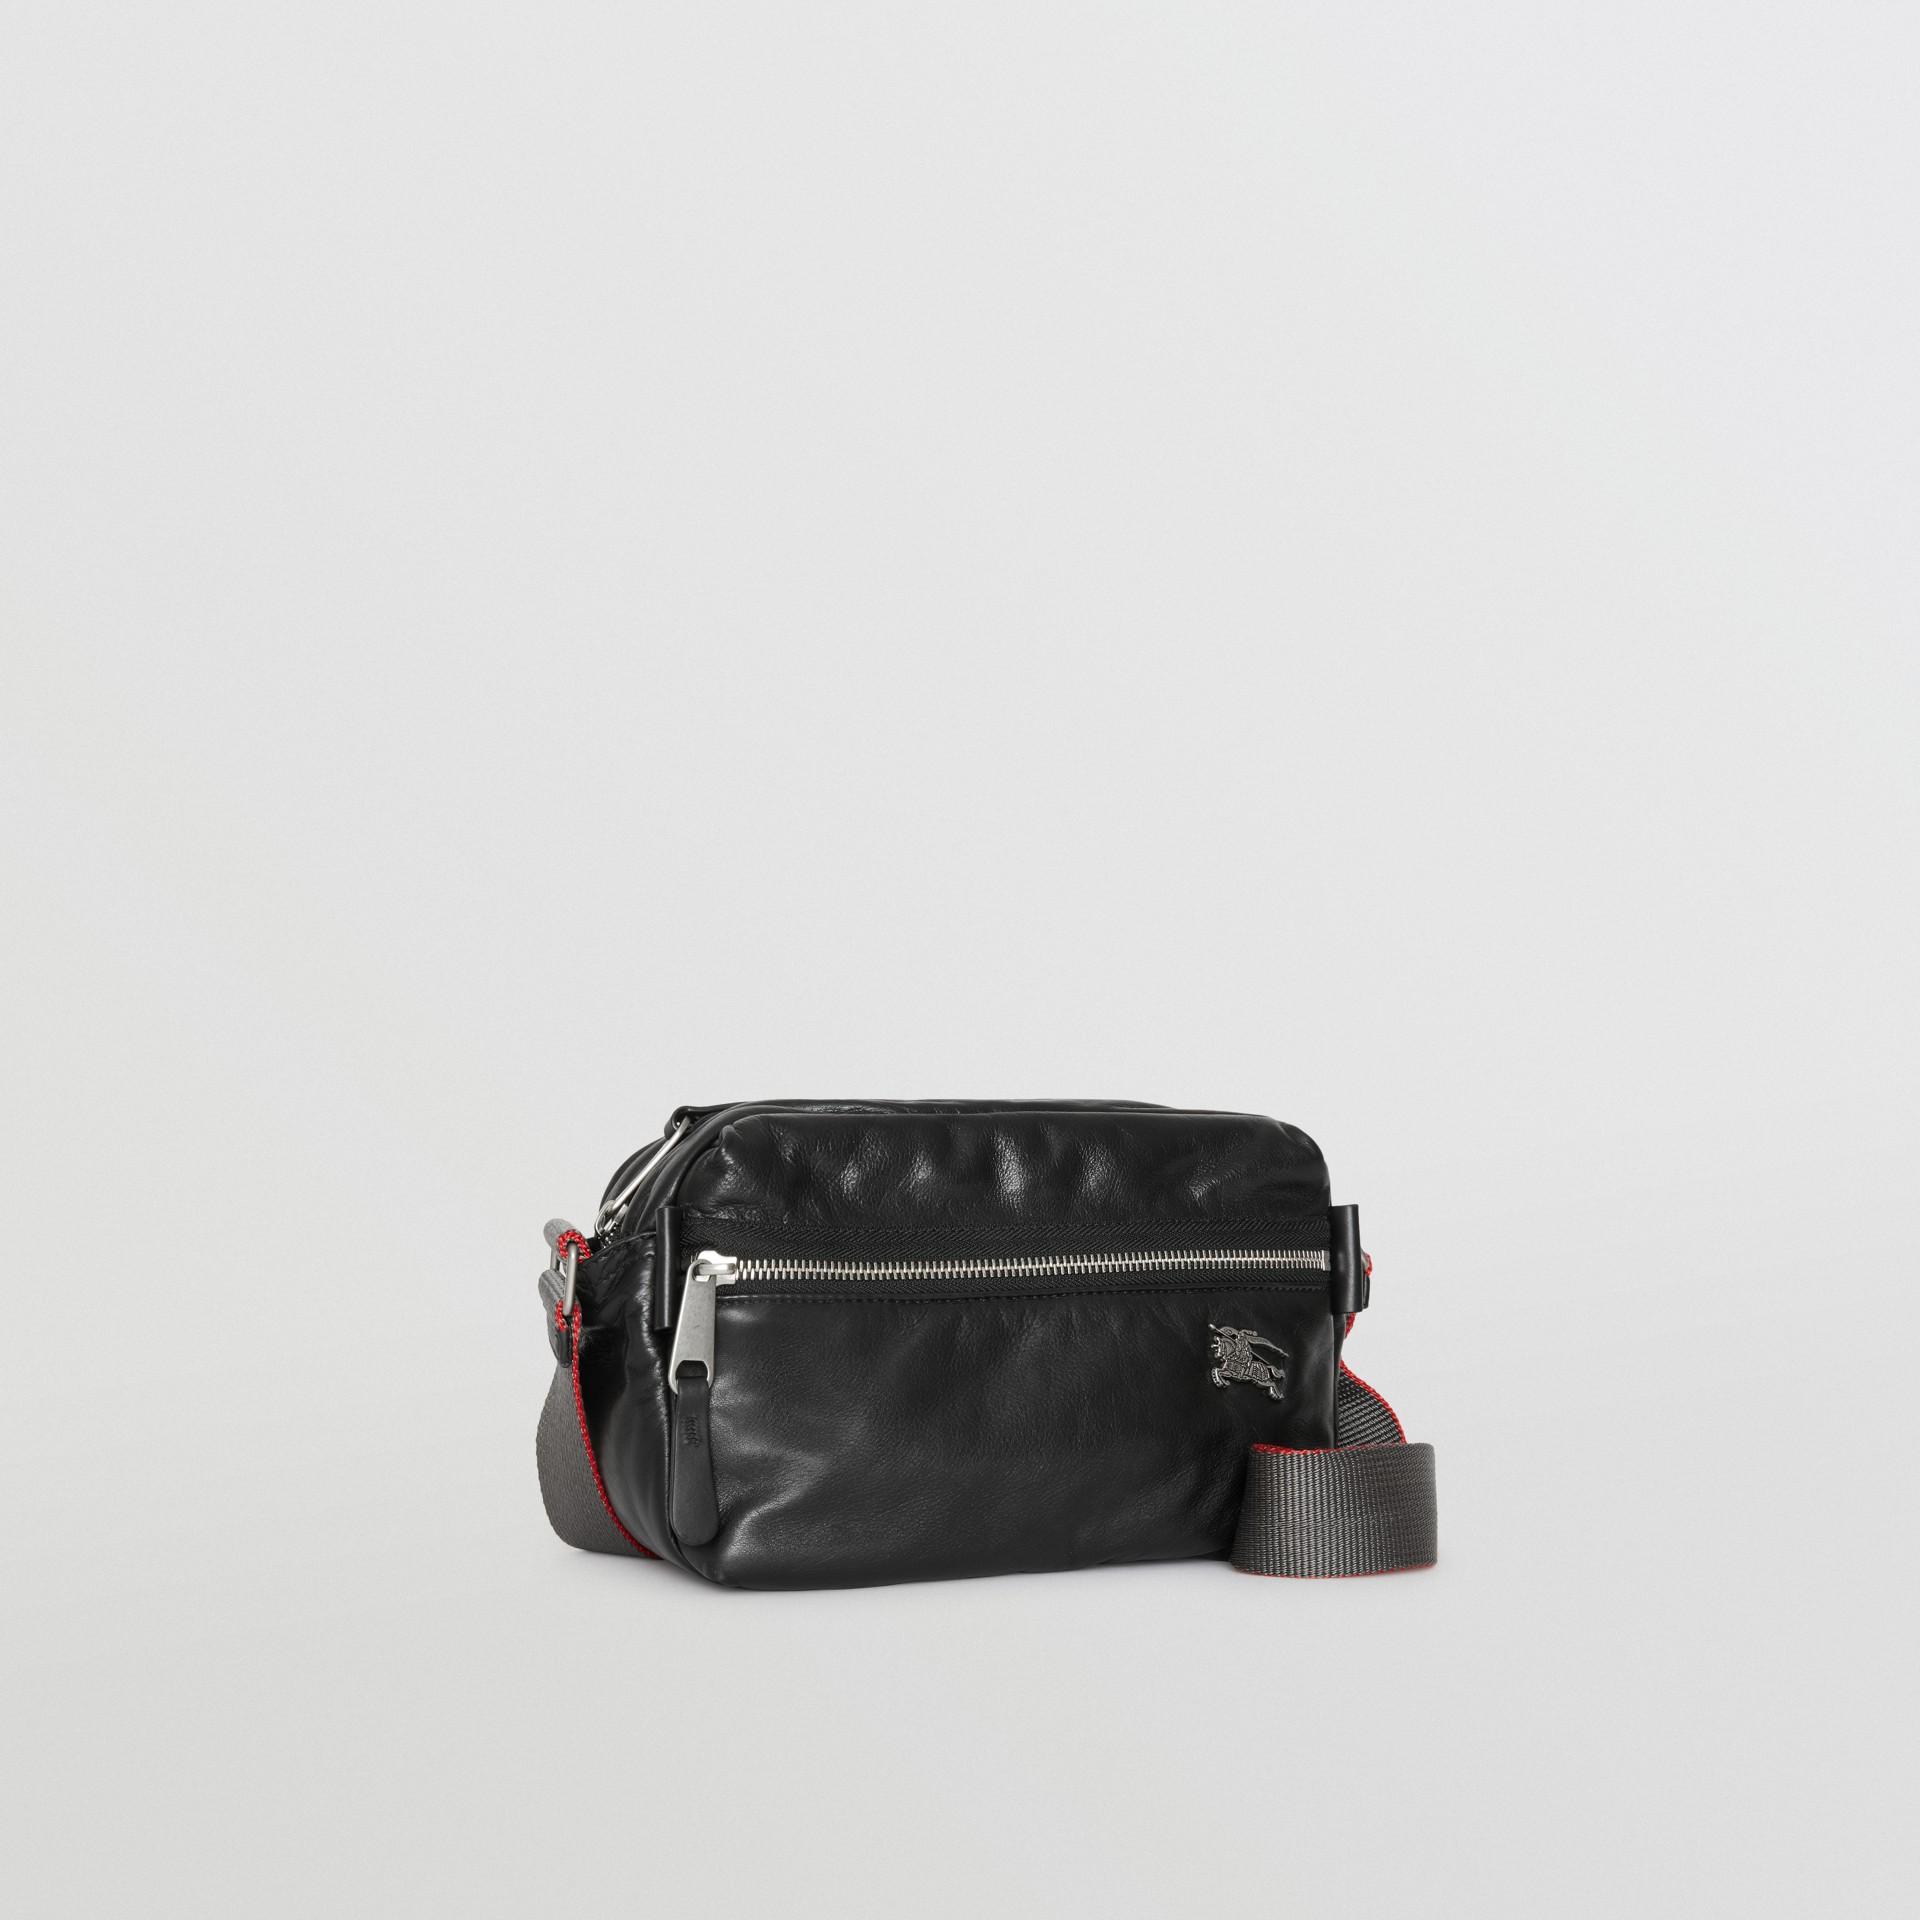 EKD Nappa Leather Crossbody Bag in Black - Men | Burberry United Kingdom - gallery image 4